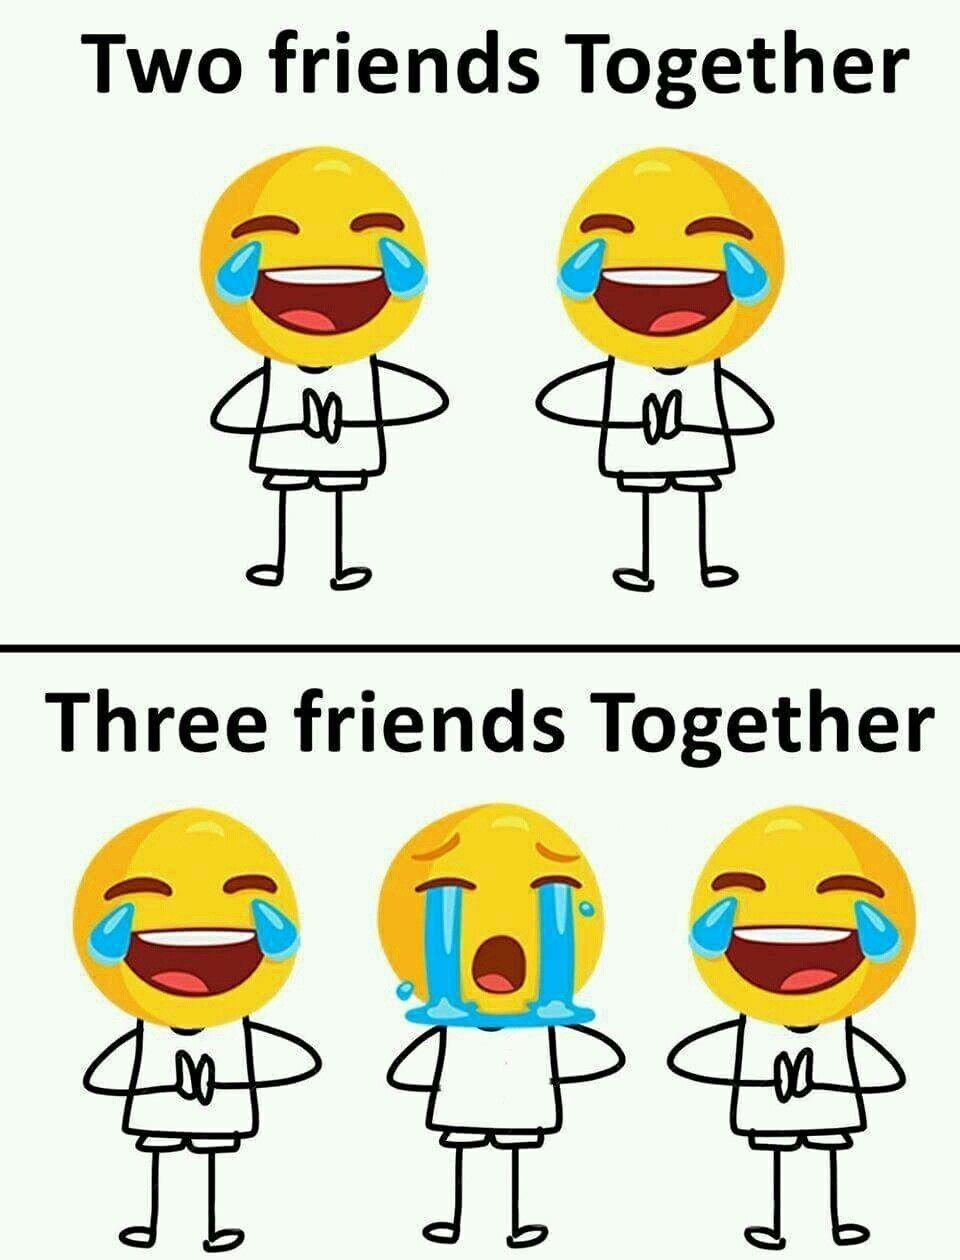 Pin By Farhađ ălį On My Fav Best Friends Funny Friends Quotes Funny Friends Funny